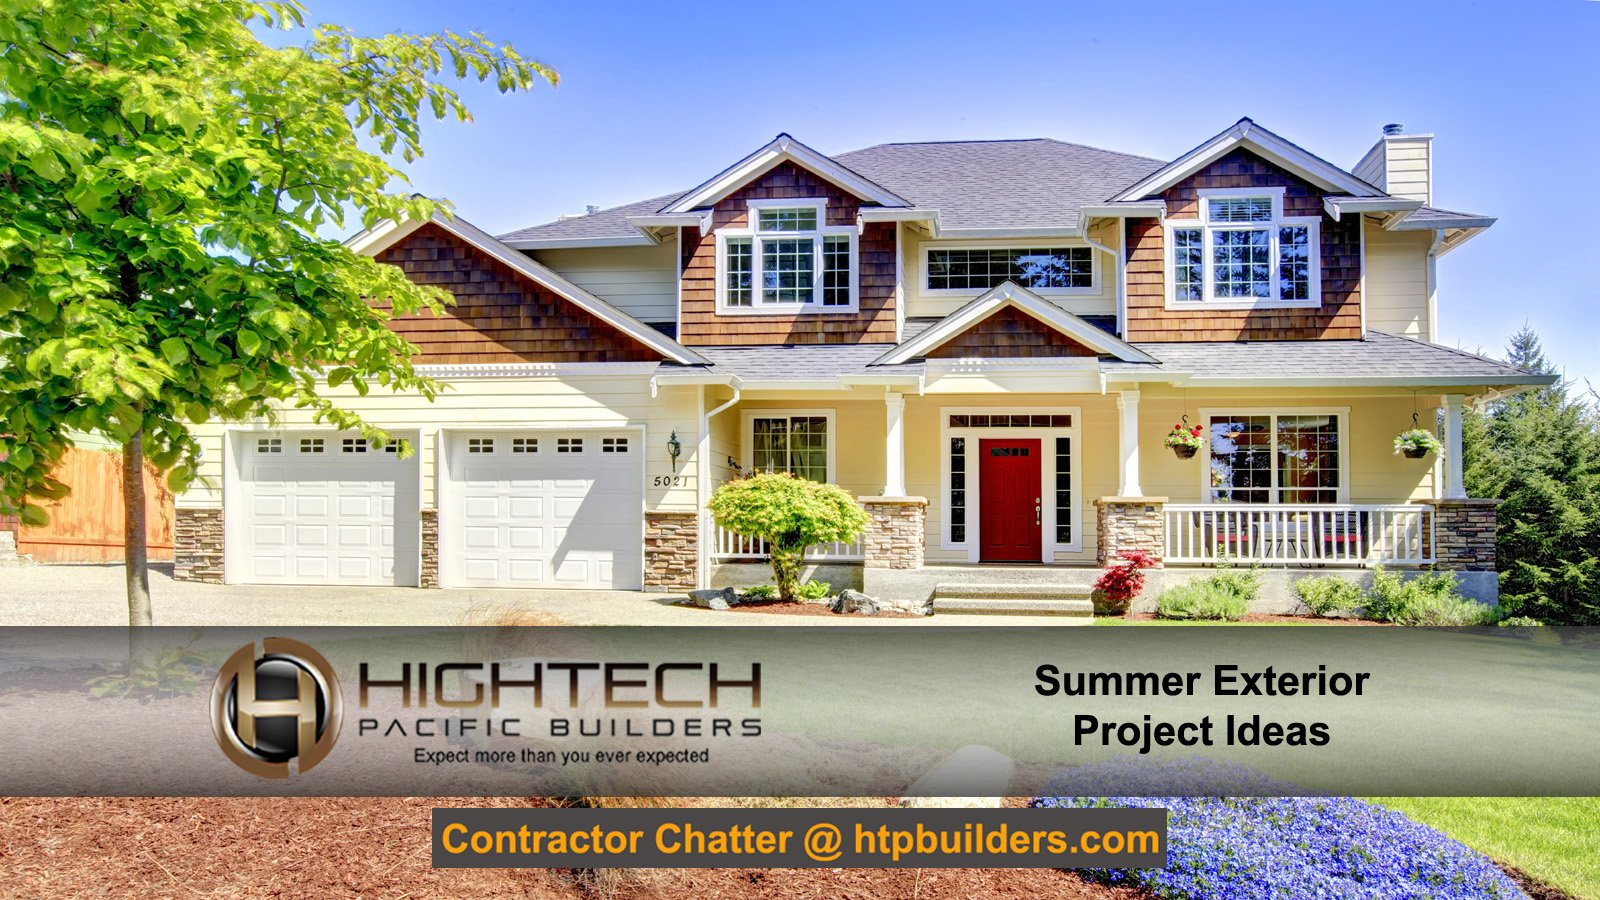 Summer exterior project ideas